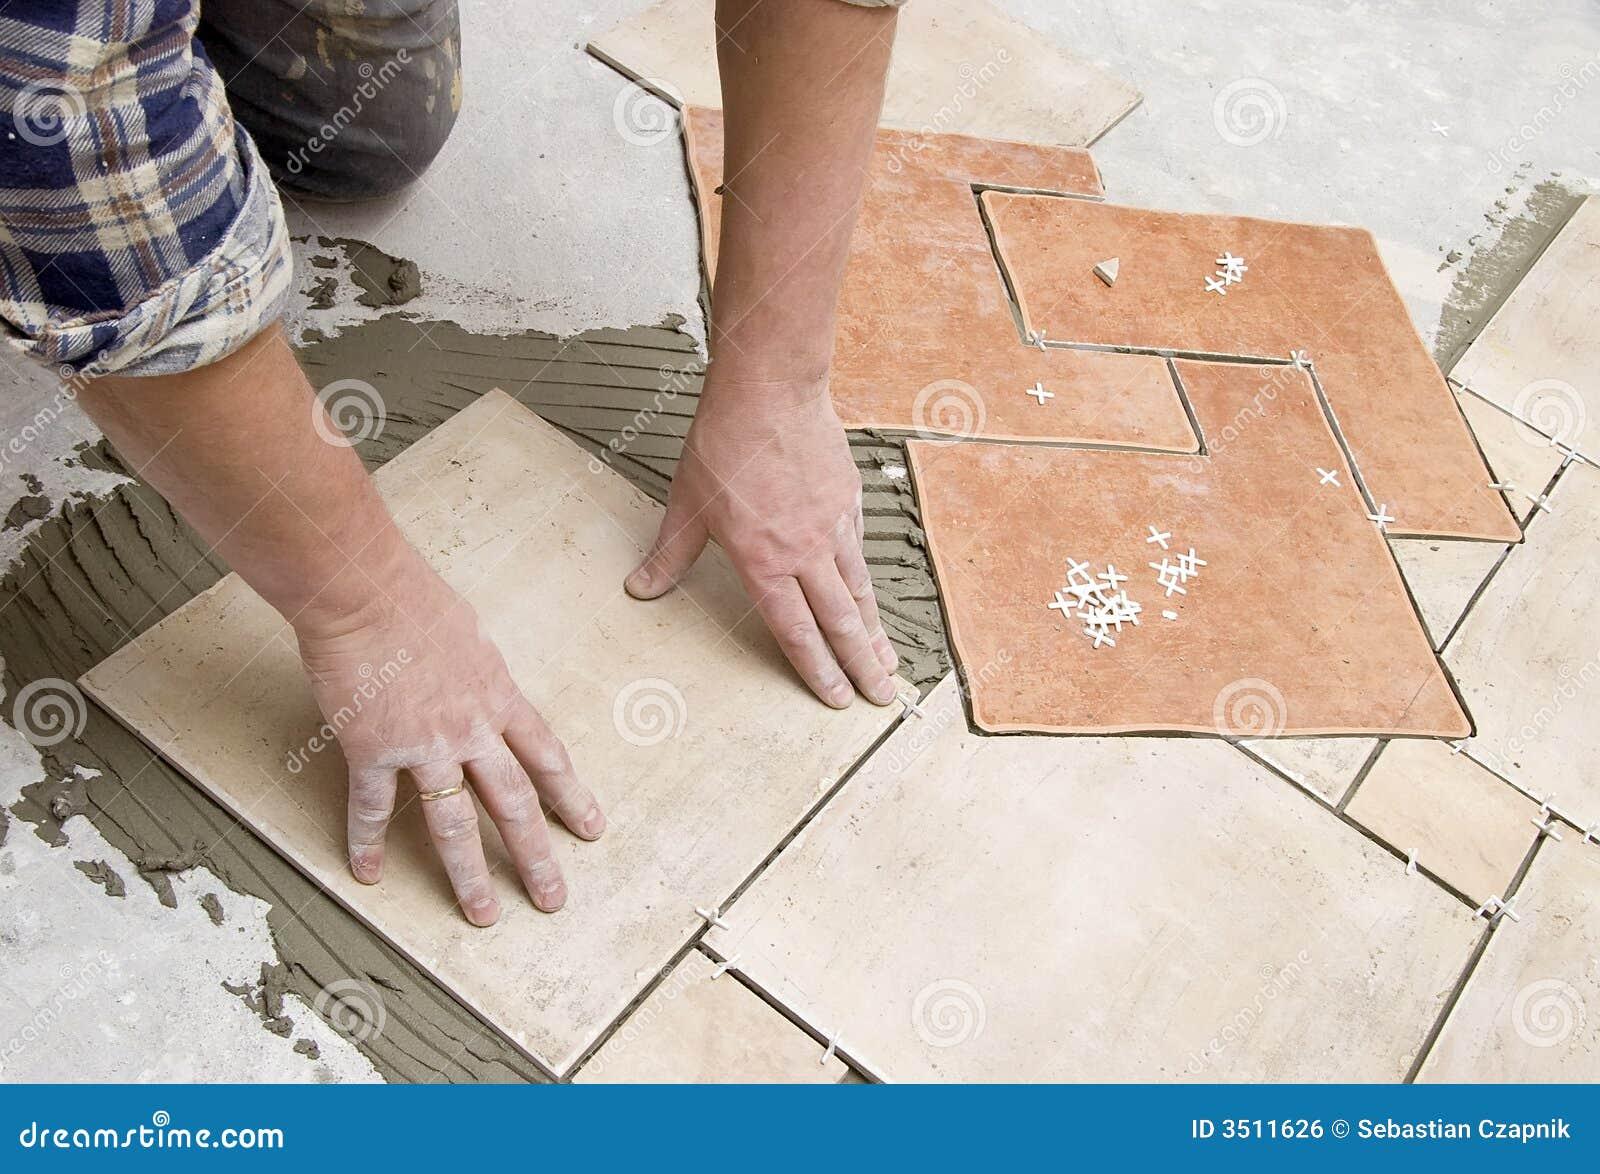 Виды работ при укладке плитки на пол